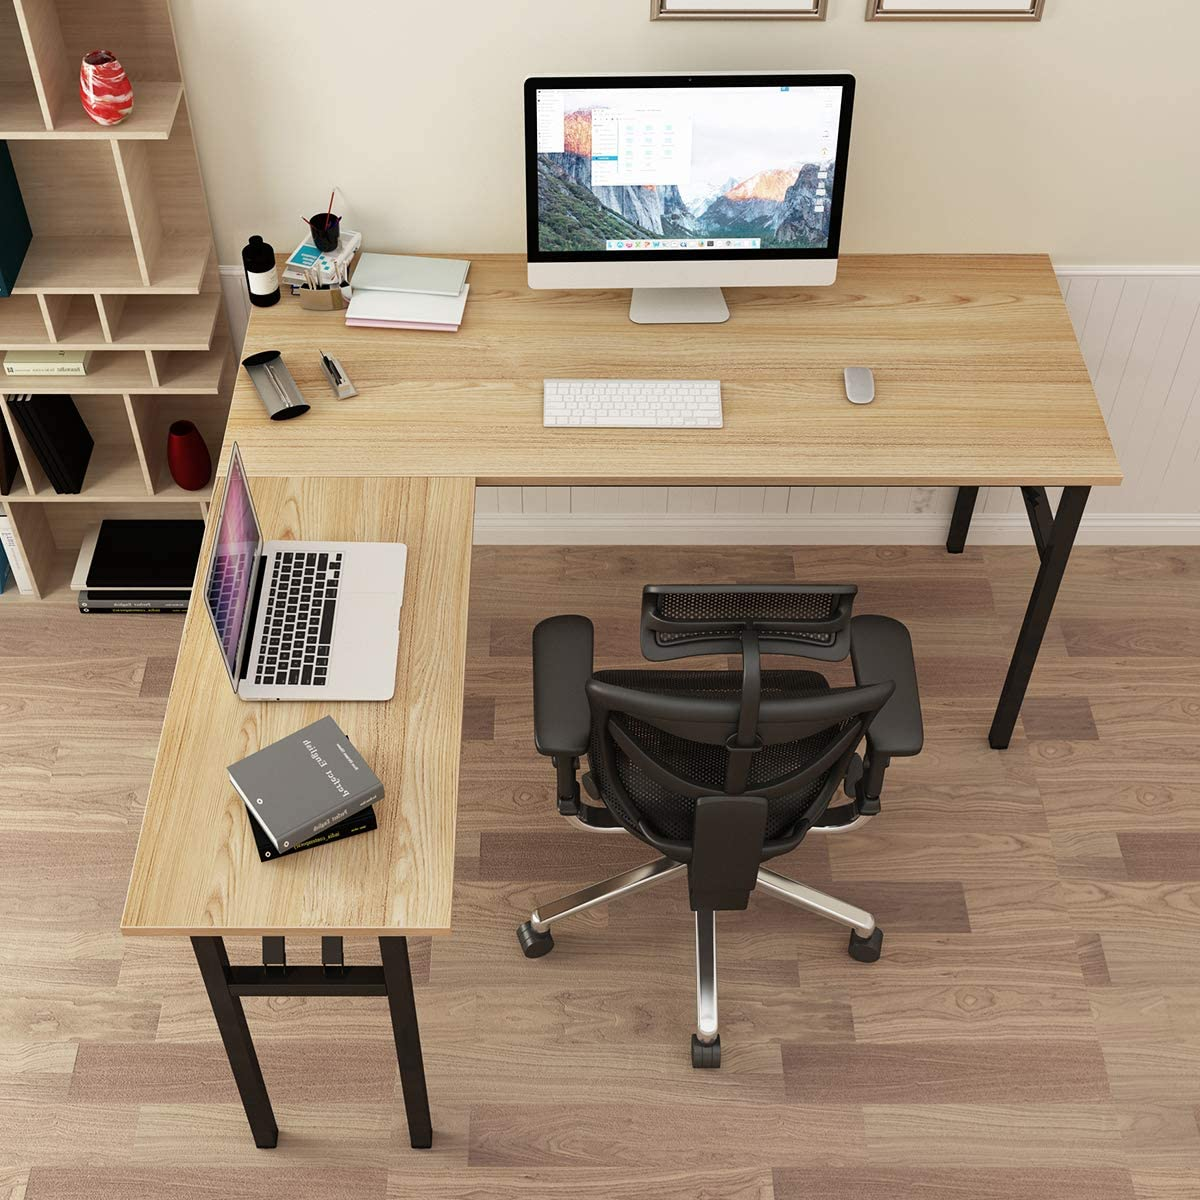 SogesPower L-Shaped Computer Table Home Office Desk Computer Desk Multifunctional Desk Workstation, Meeting Desk, Large Study Desk, Studio Table, Teak Top & Black Legs, SPND-AC11BB